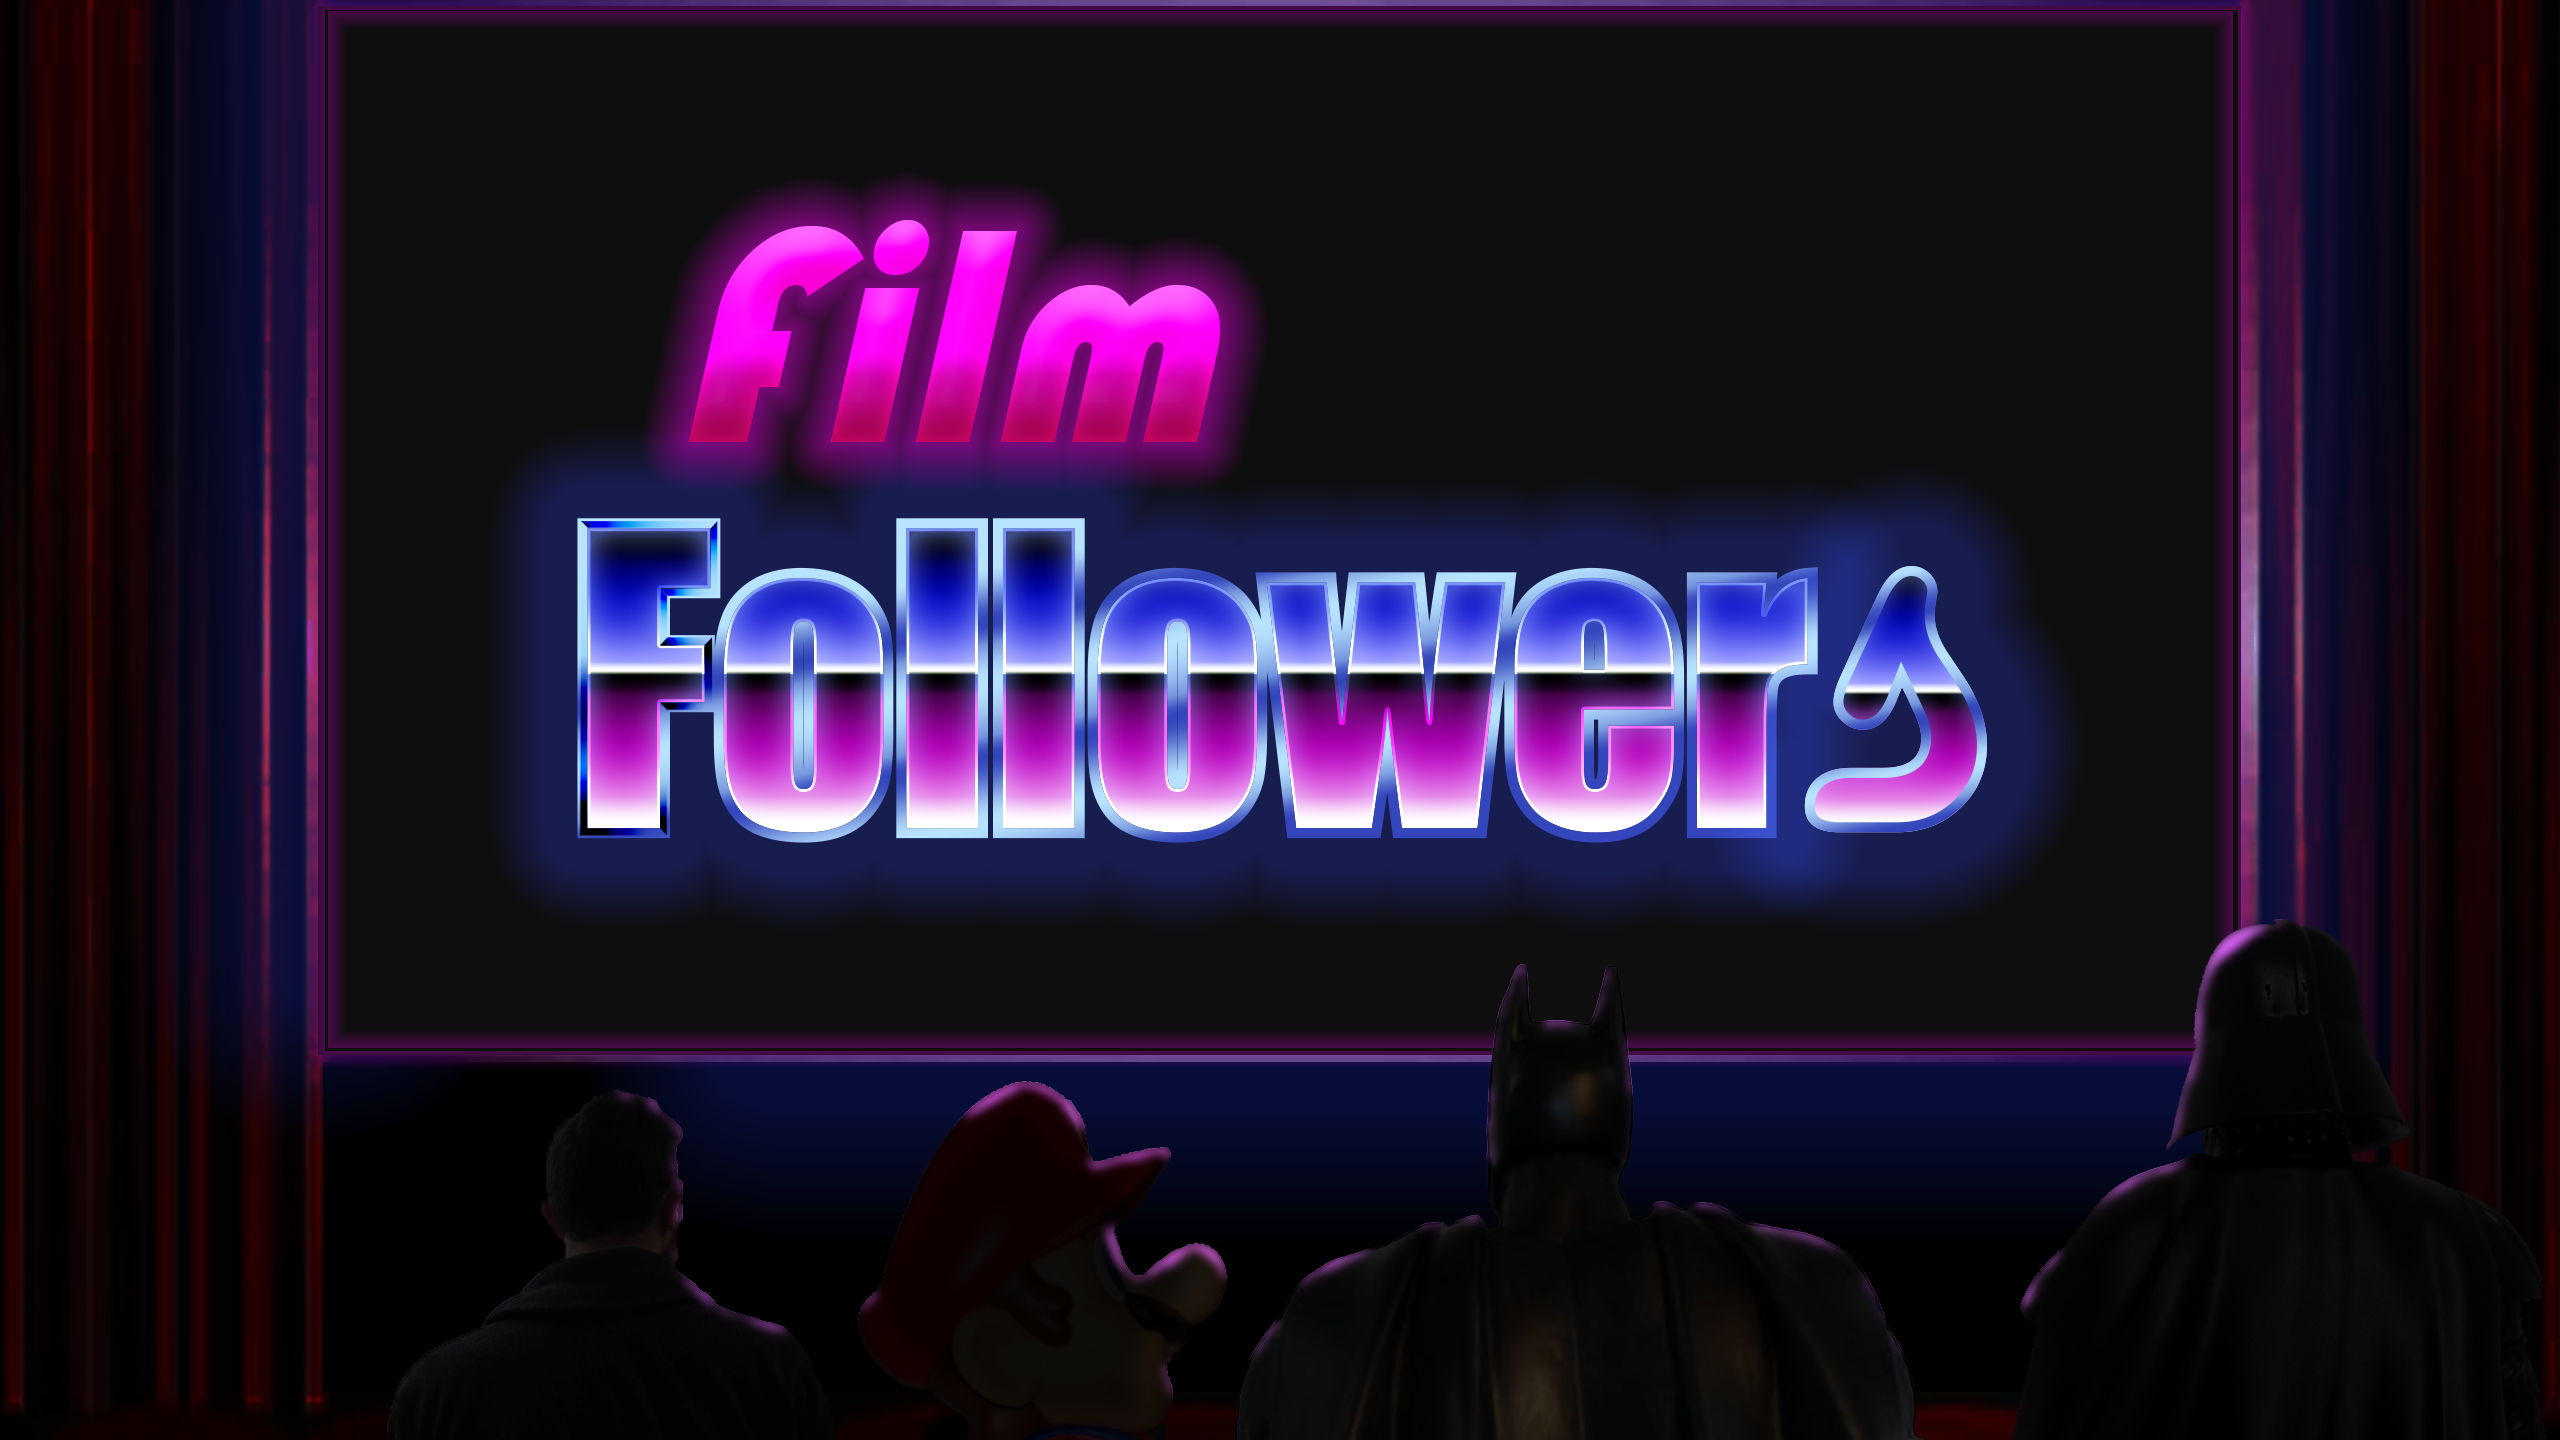 Film_Followers_Banner_YT (2017_12_20 03_32_14 UTC)